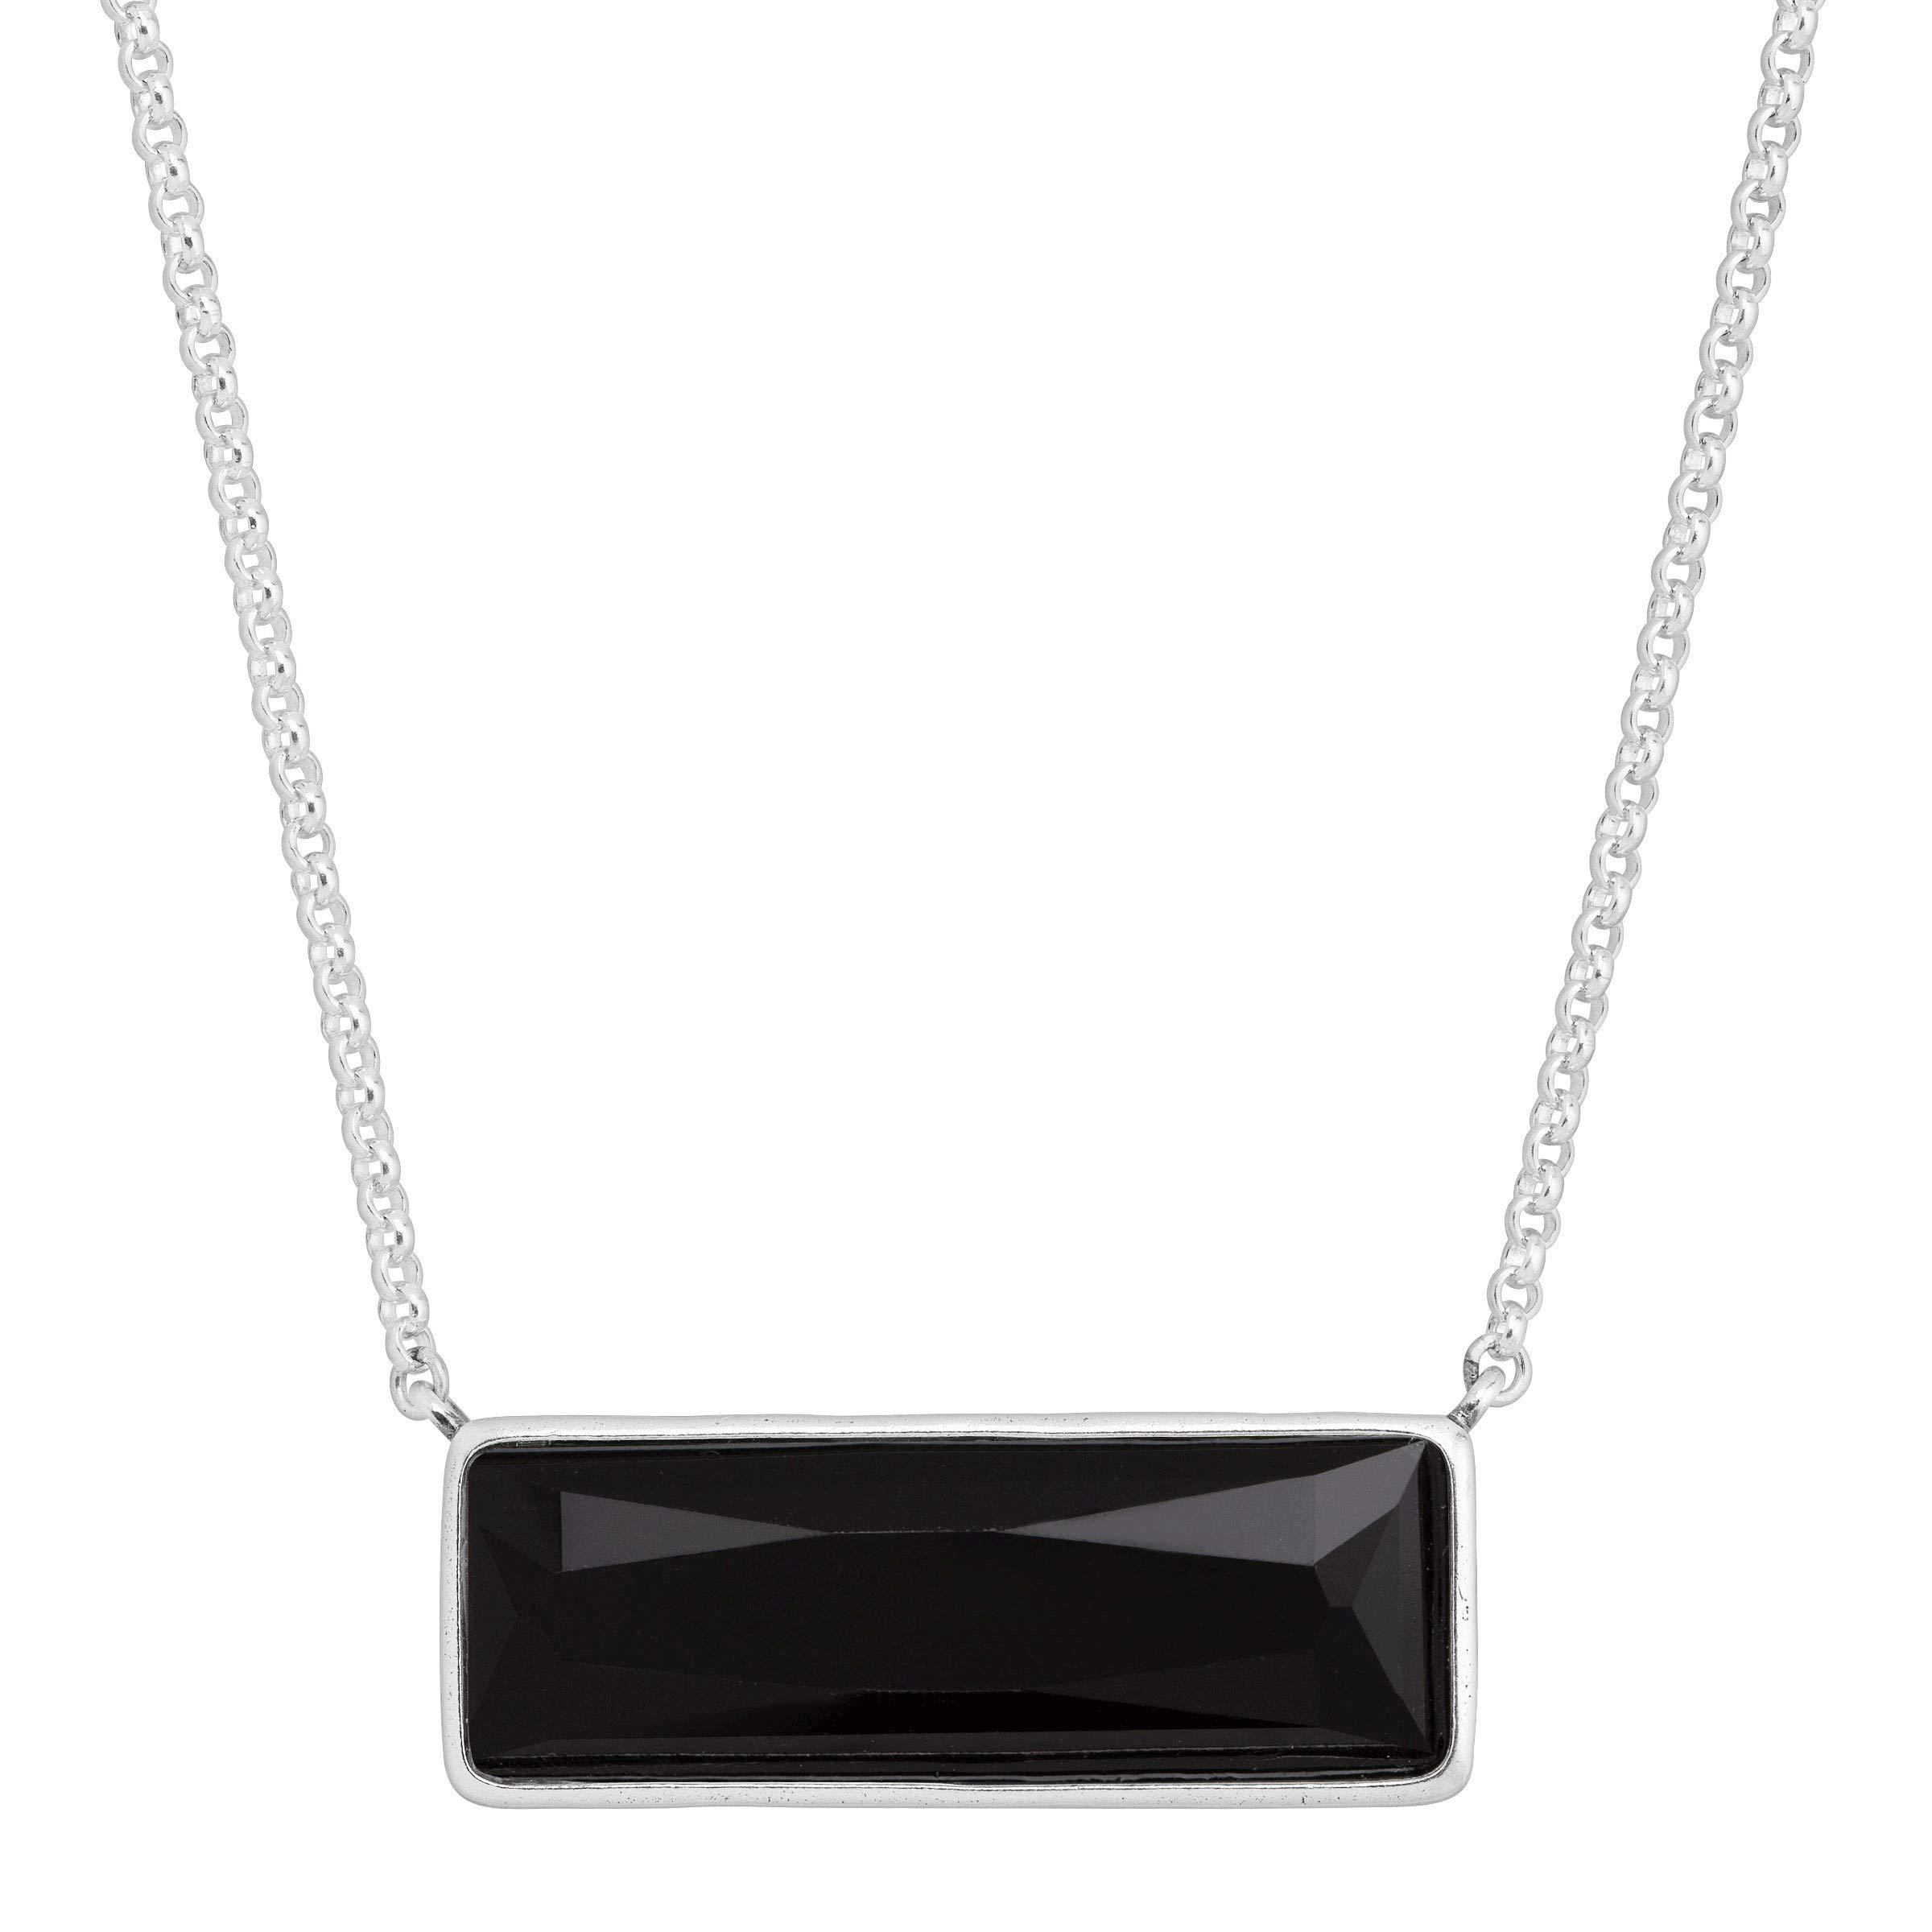 Silpada 'Noire' Jet Black Swarovski Crystal Necklace in Sterling Silver